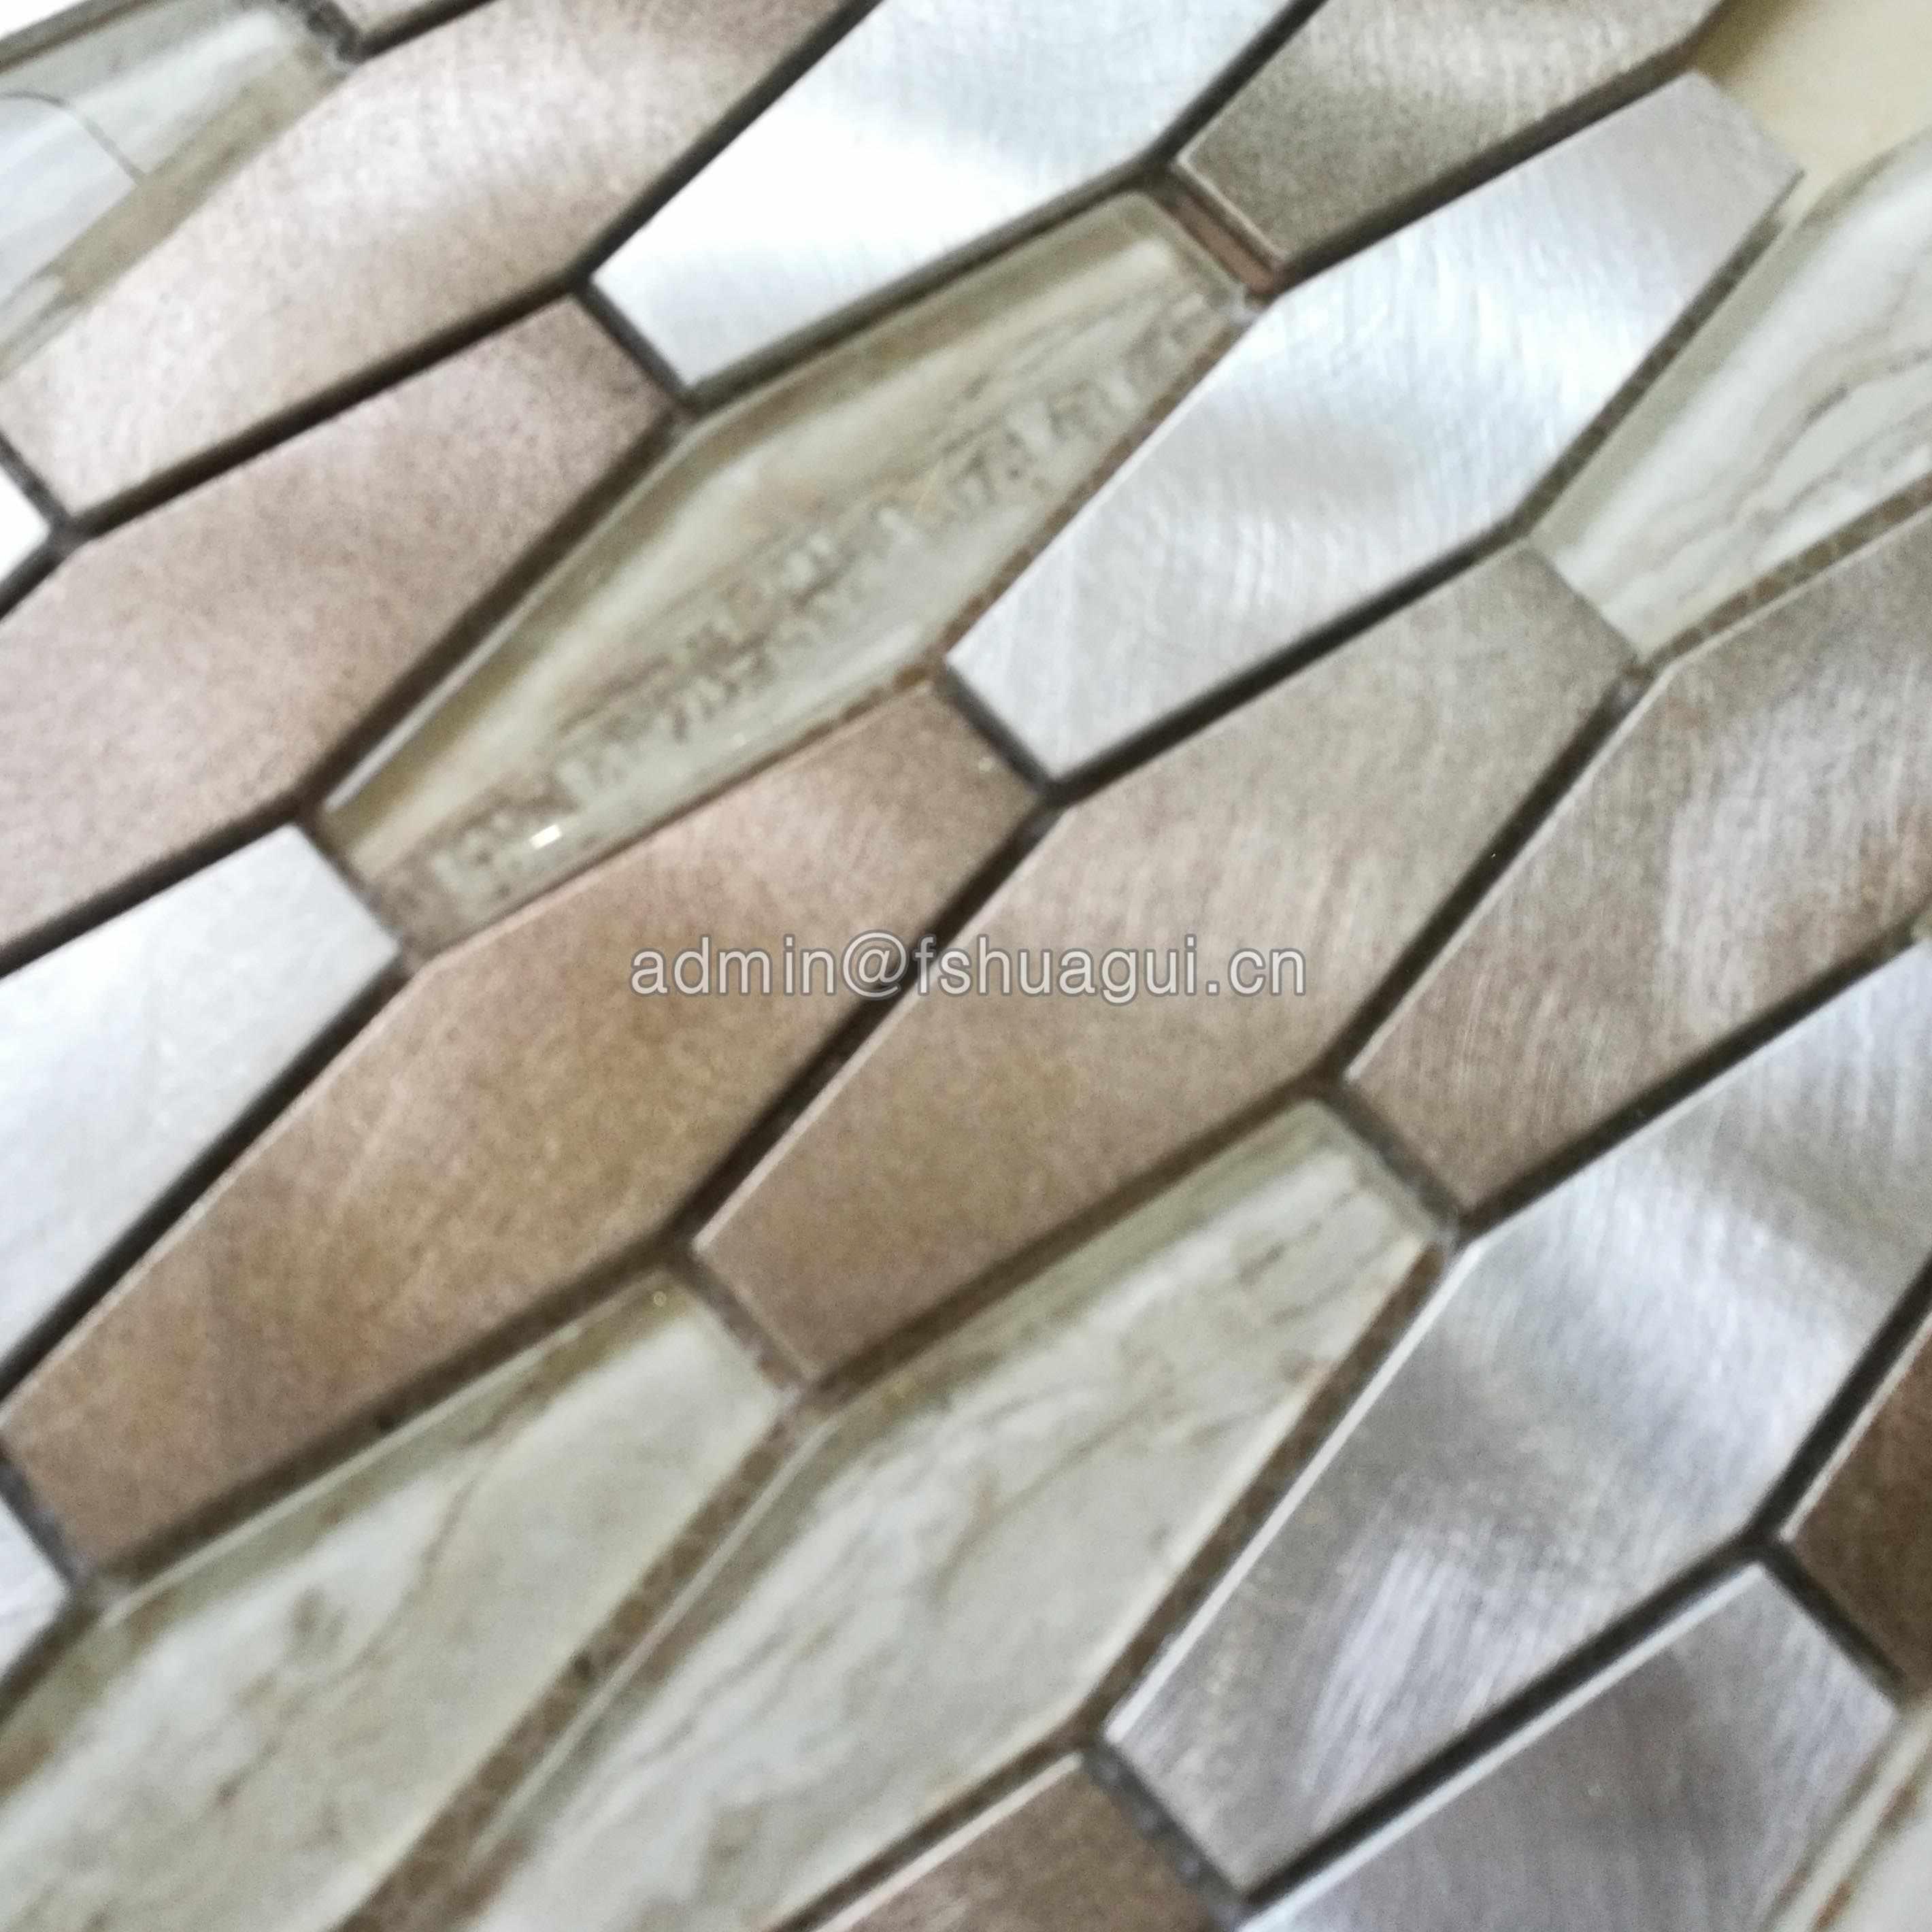 Huagui Mixed Brown Hexagon Metal Glass Stone Mosaic Tile Backsplash GLASS MOSAIC TILE image116